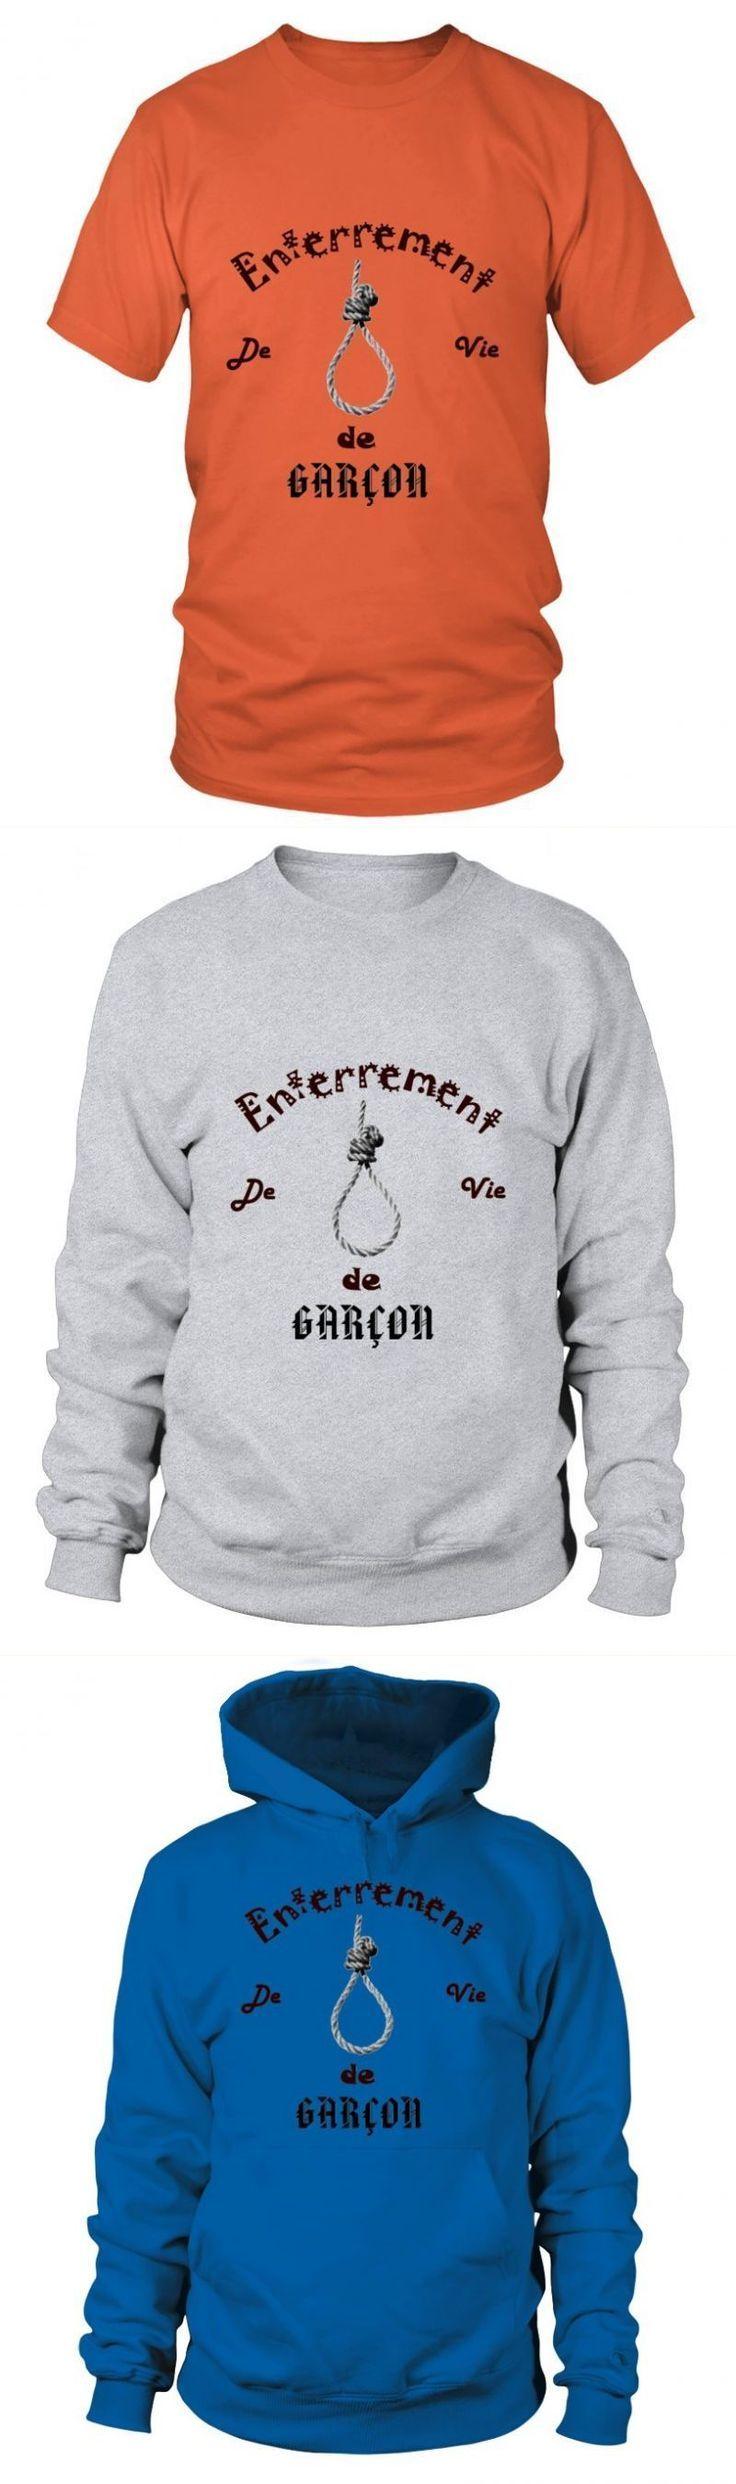 Wedding t-shirt design evg – bachelor party boy royal wedding t shirt ebay